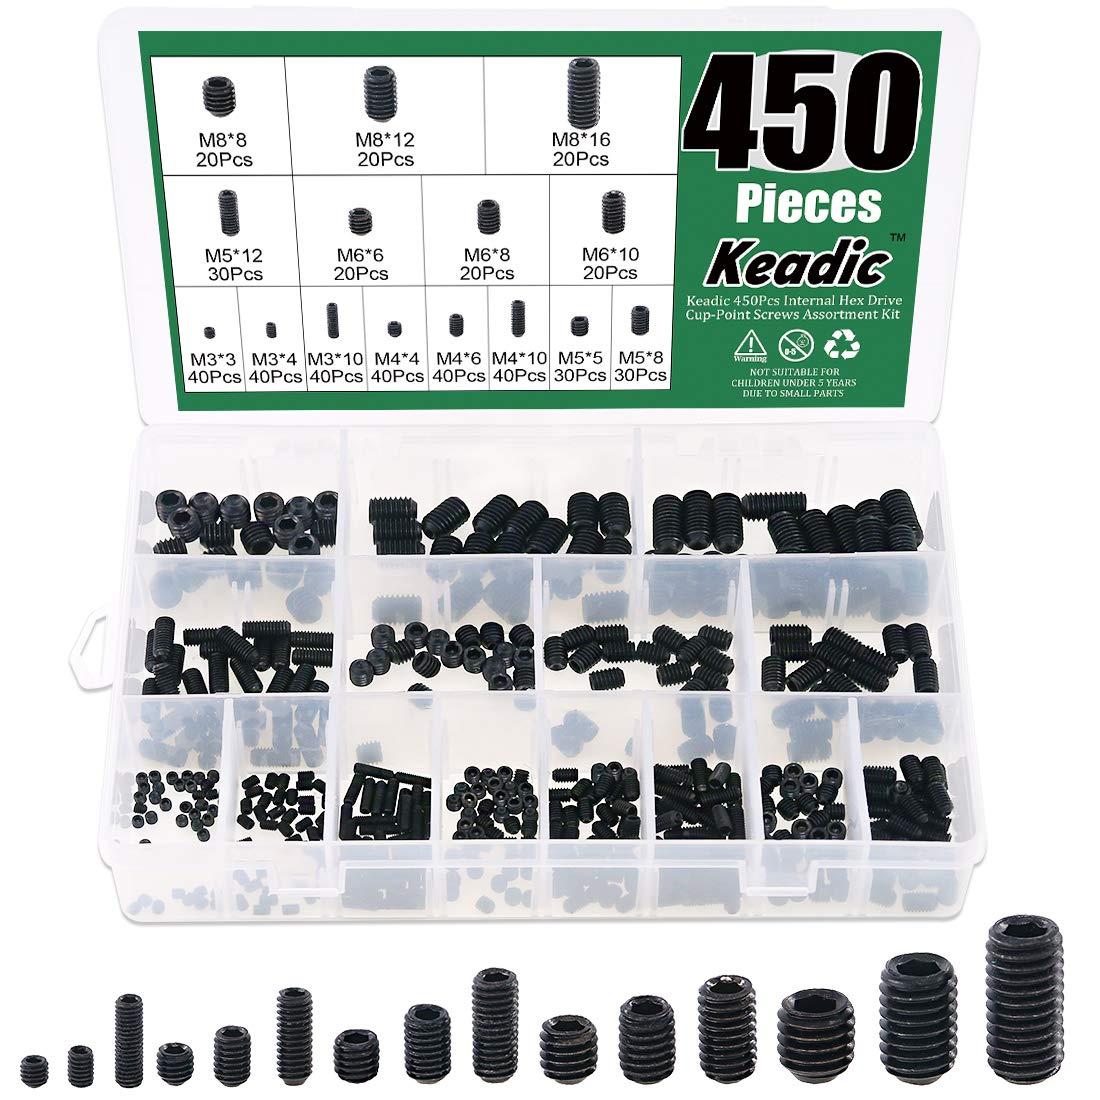 Keadic 450Pcs Internal Hex Drive Cup-Point Screws Assortment Kit, 15 Sizes M3/4/5/6/8 Set Screw Set for Door Handles, Faucet, Light Fixture, 12.9 Class Alloy Steel (Black)